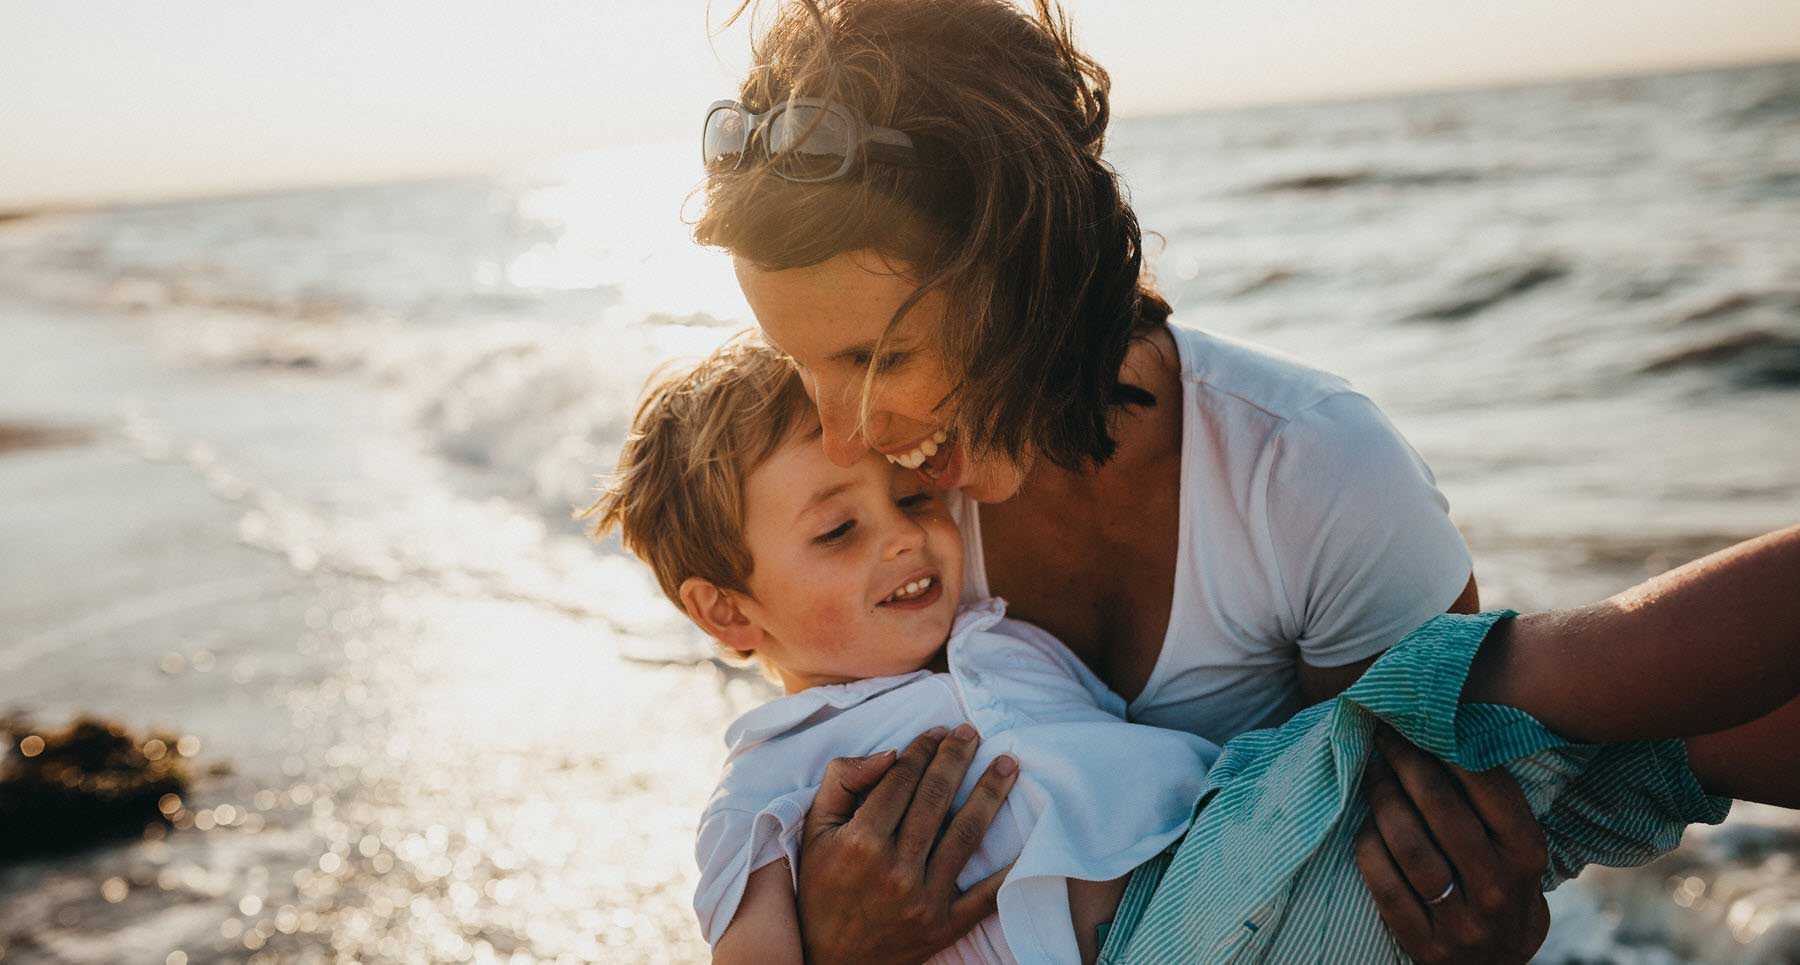 mother loving her son after her ex left them